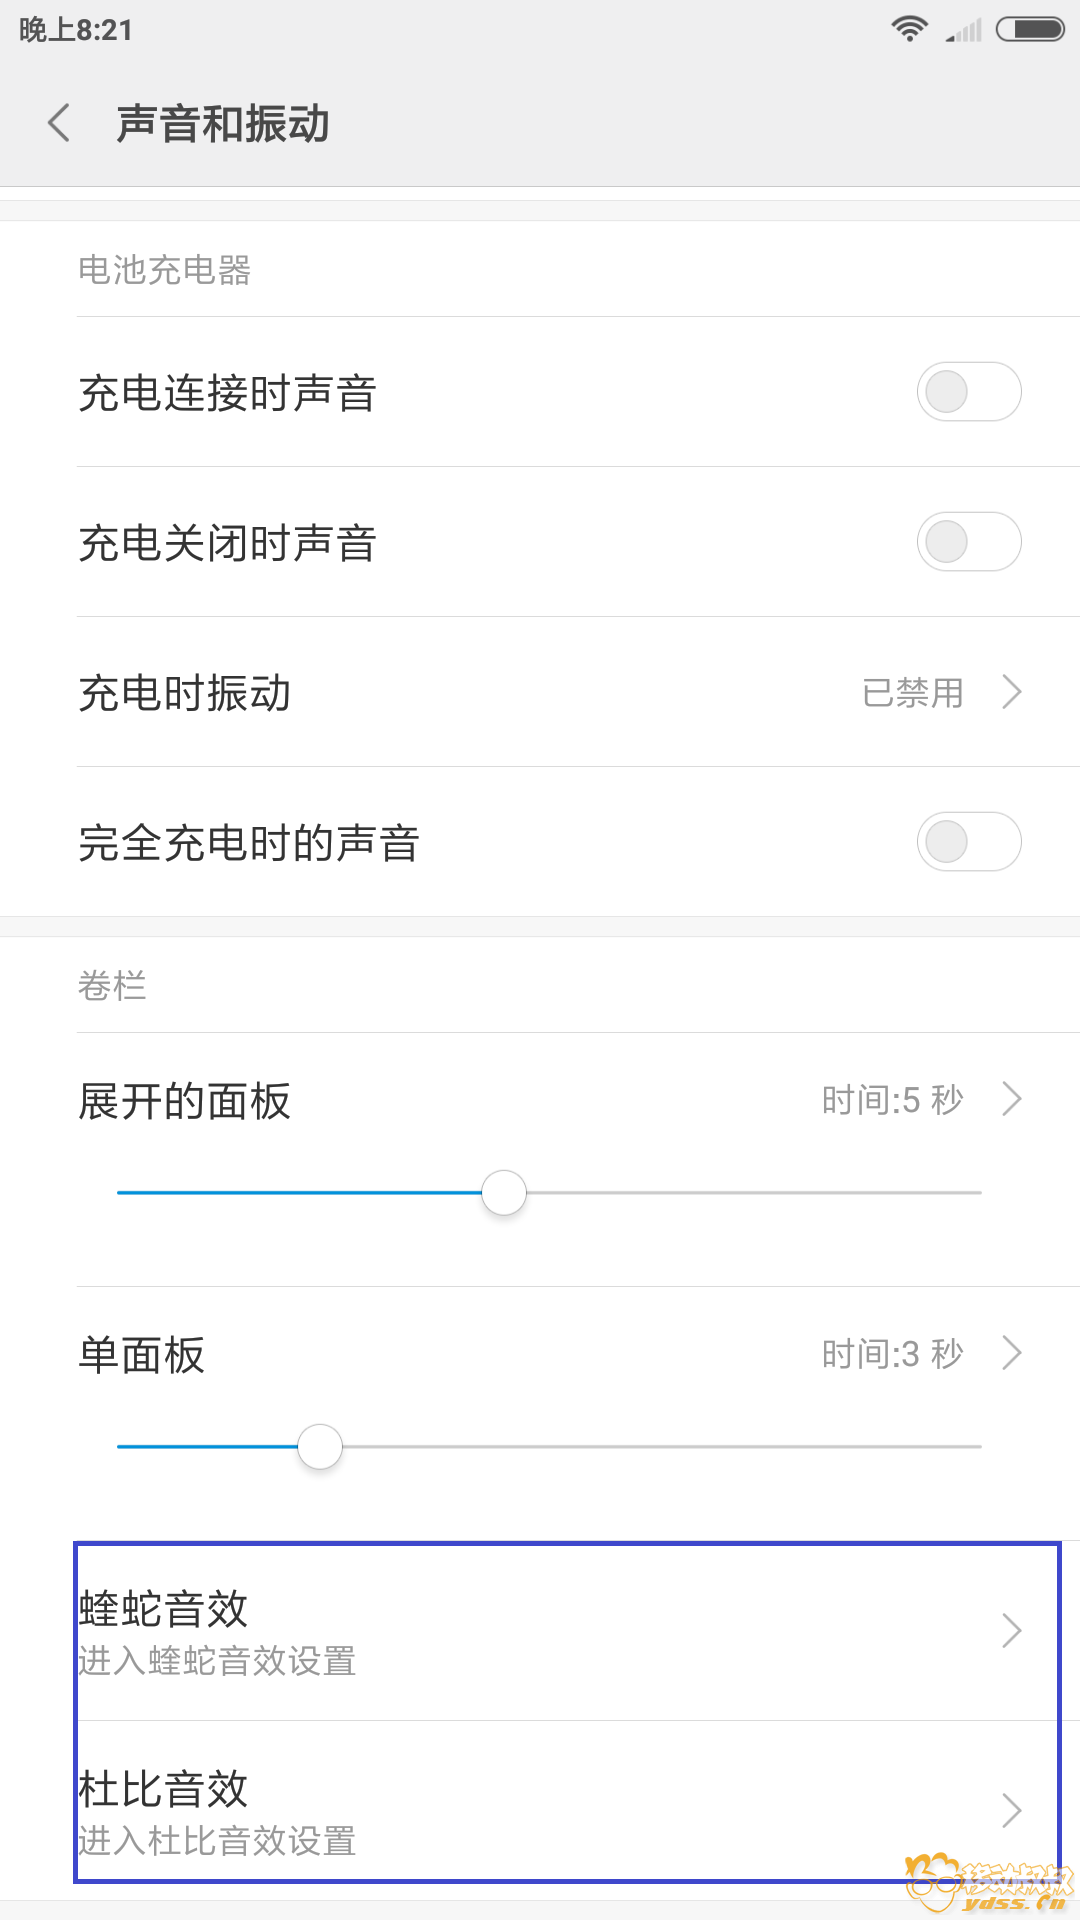 Screenshot_2018-02-28-20-21-33-097_com.android.settings.png